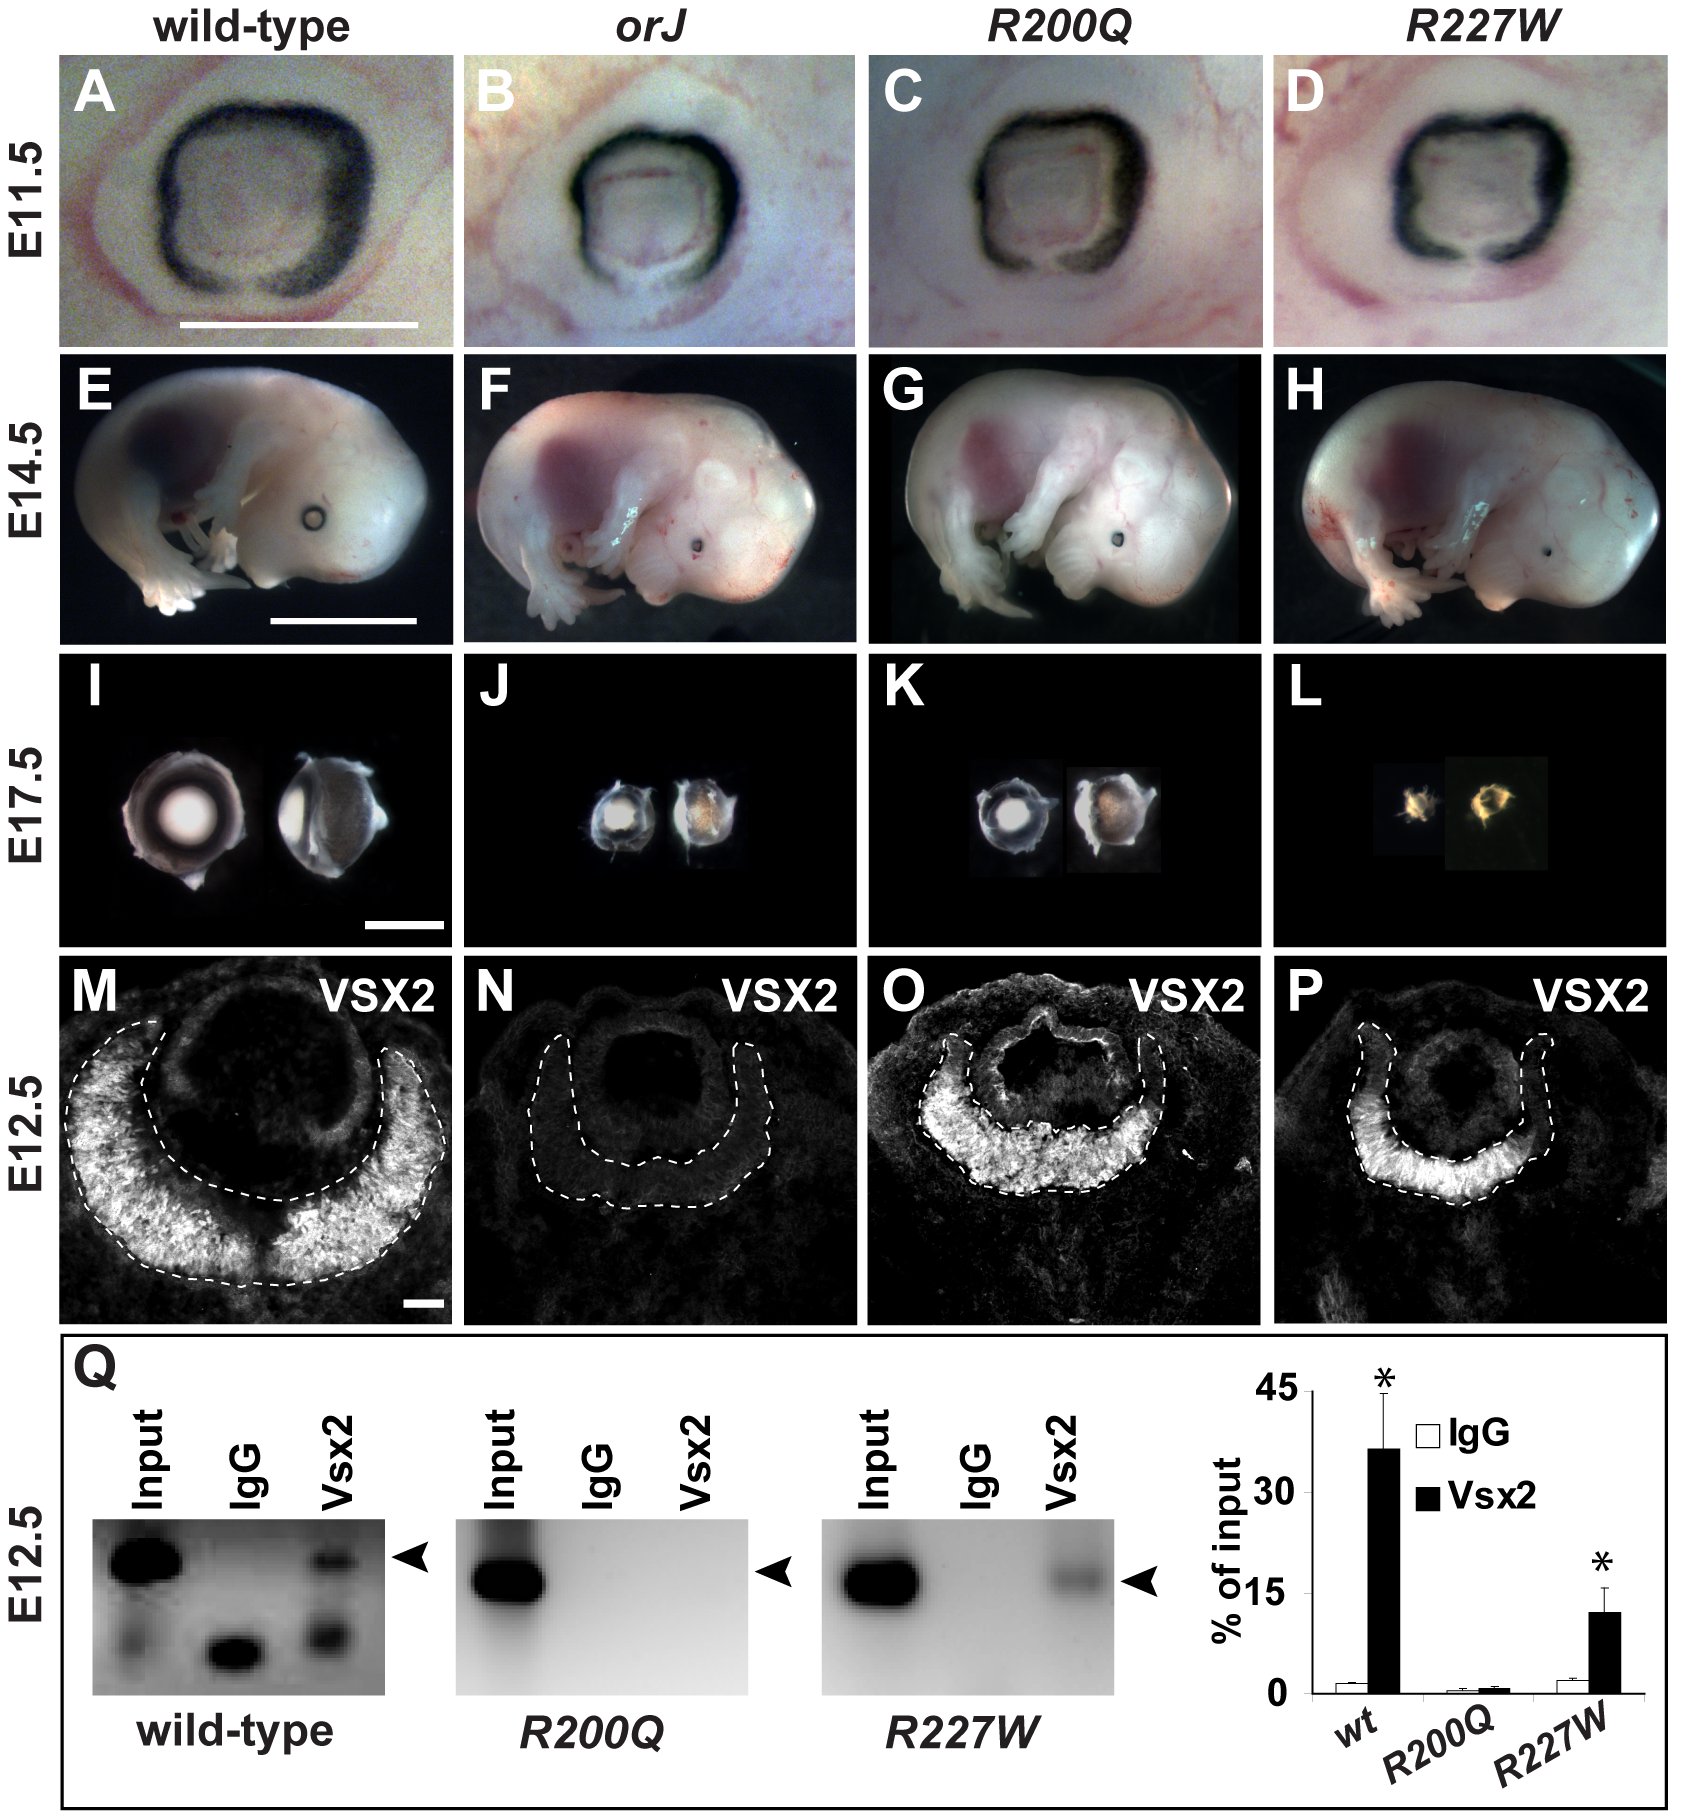 The <i>R200Q</i> and <i>R227W</i> mutations cause non-syndromic congenital microphthalmia.